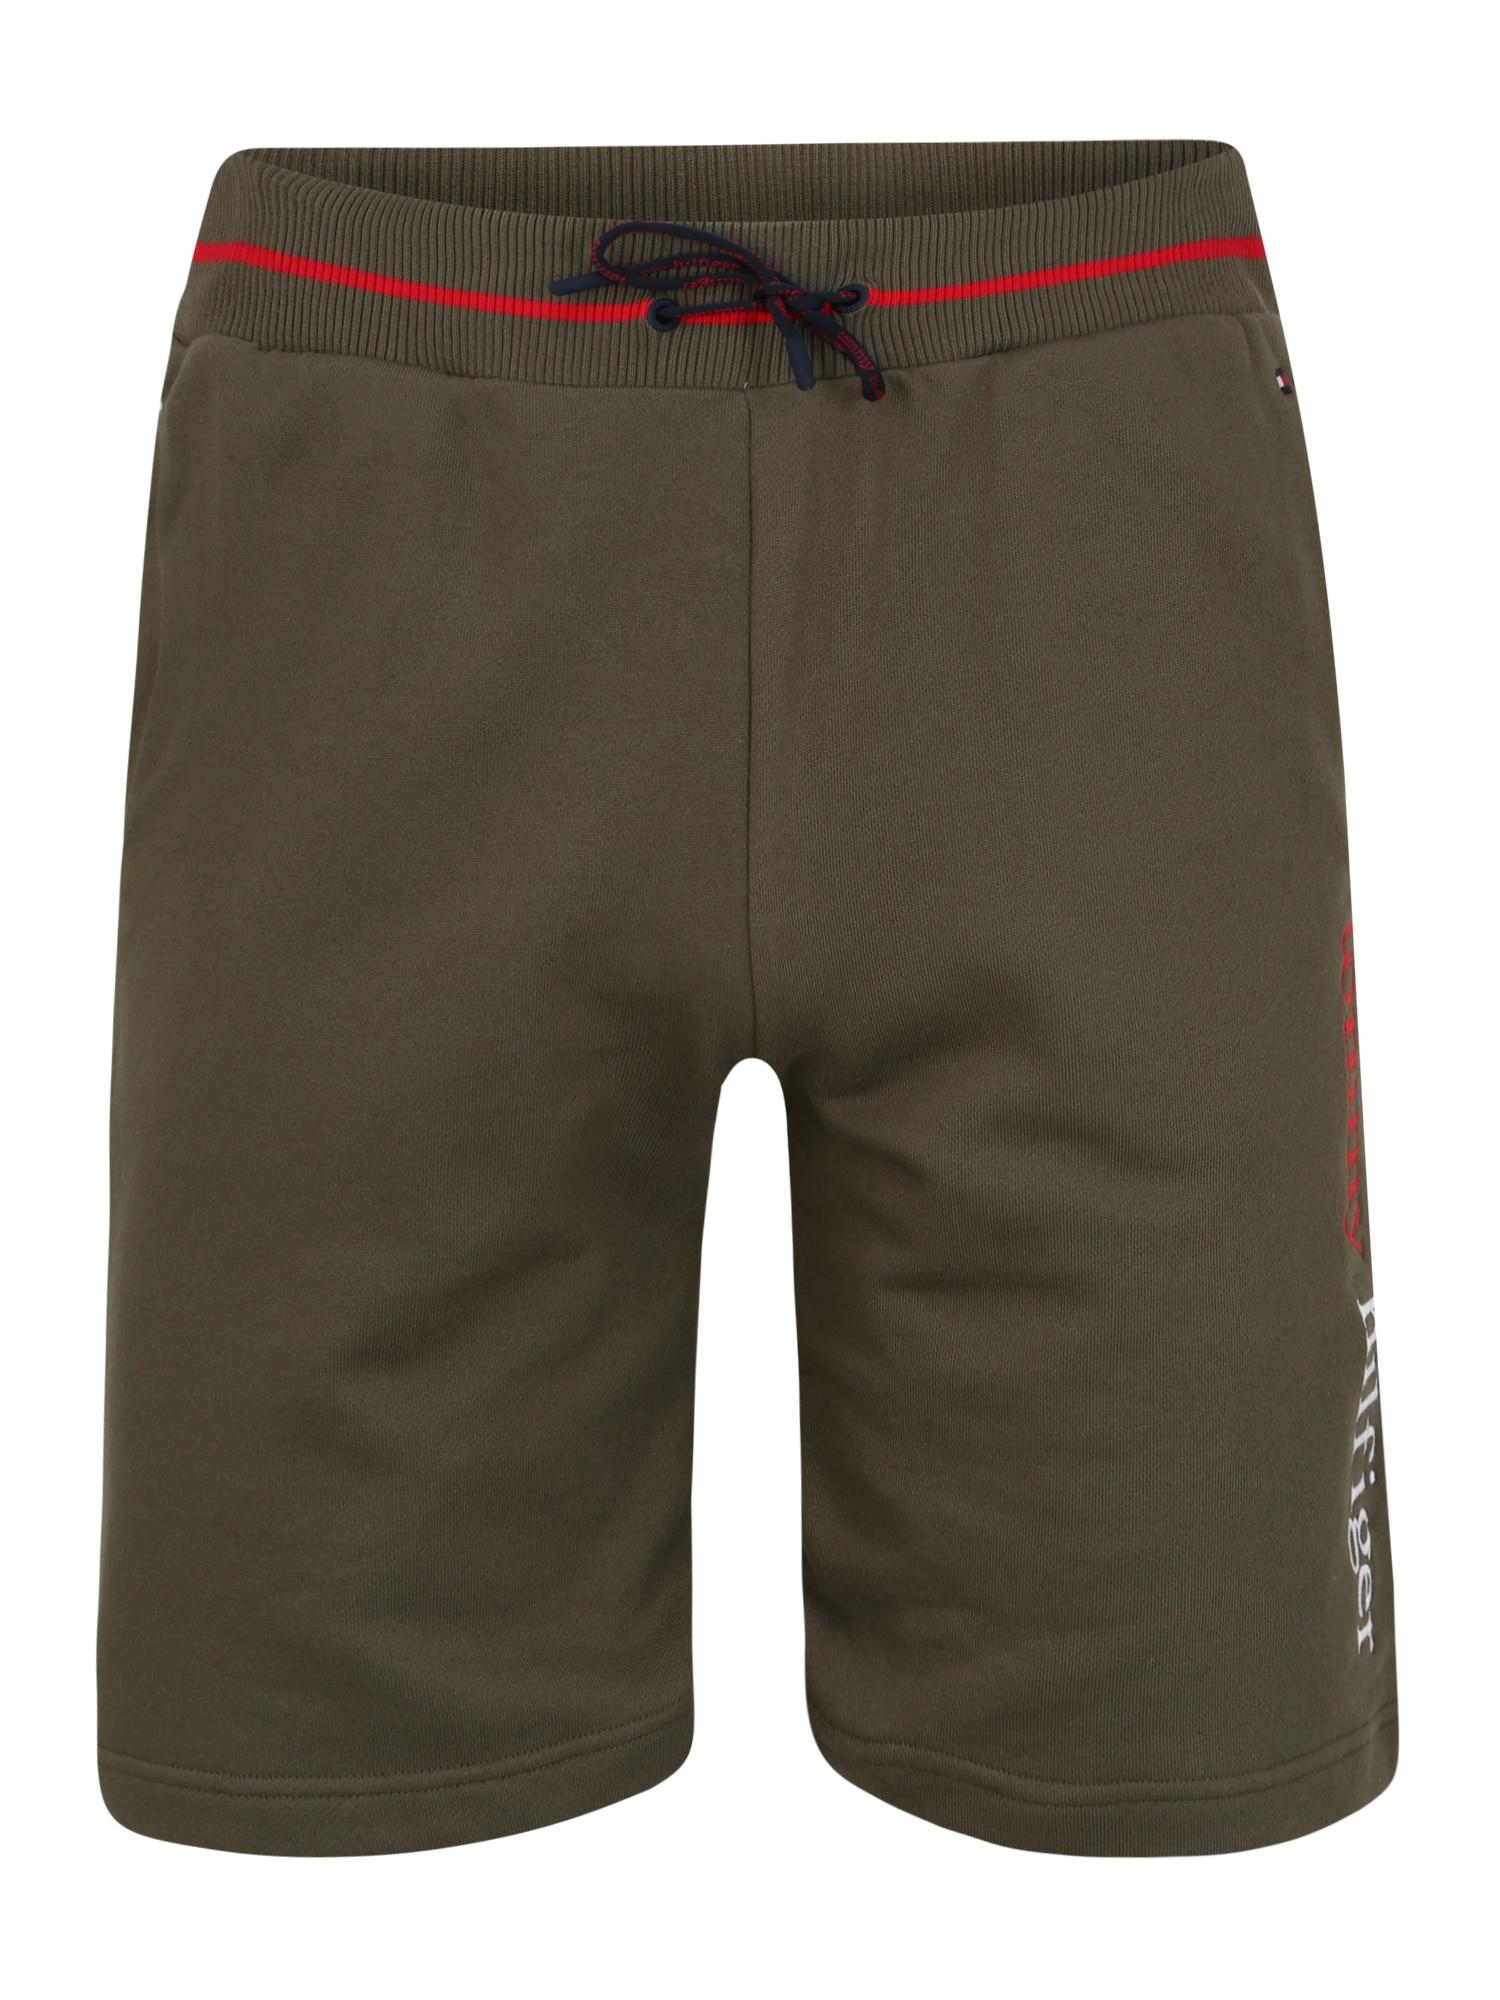 Tommy Hilfiger Underwear Kelnės 'LWK' tamsiai žalia / balta / raudona